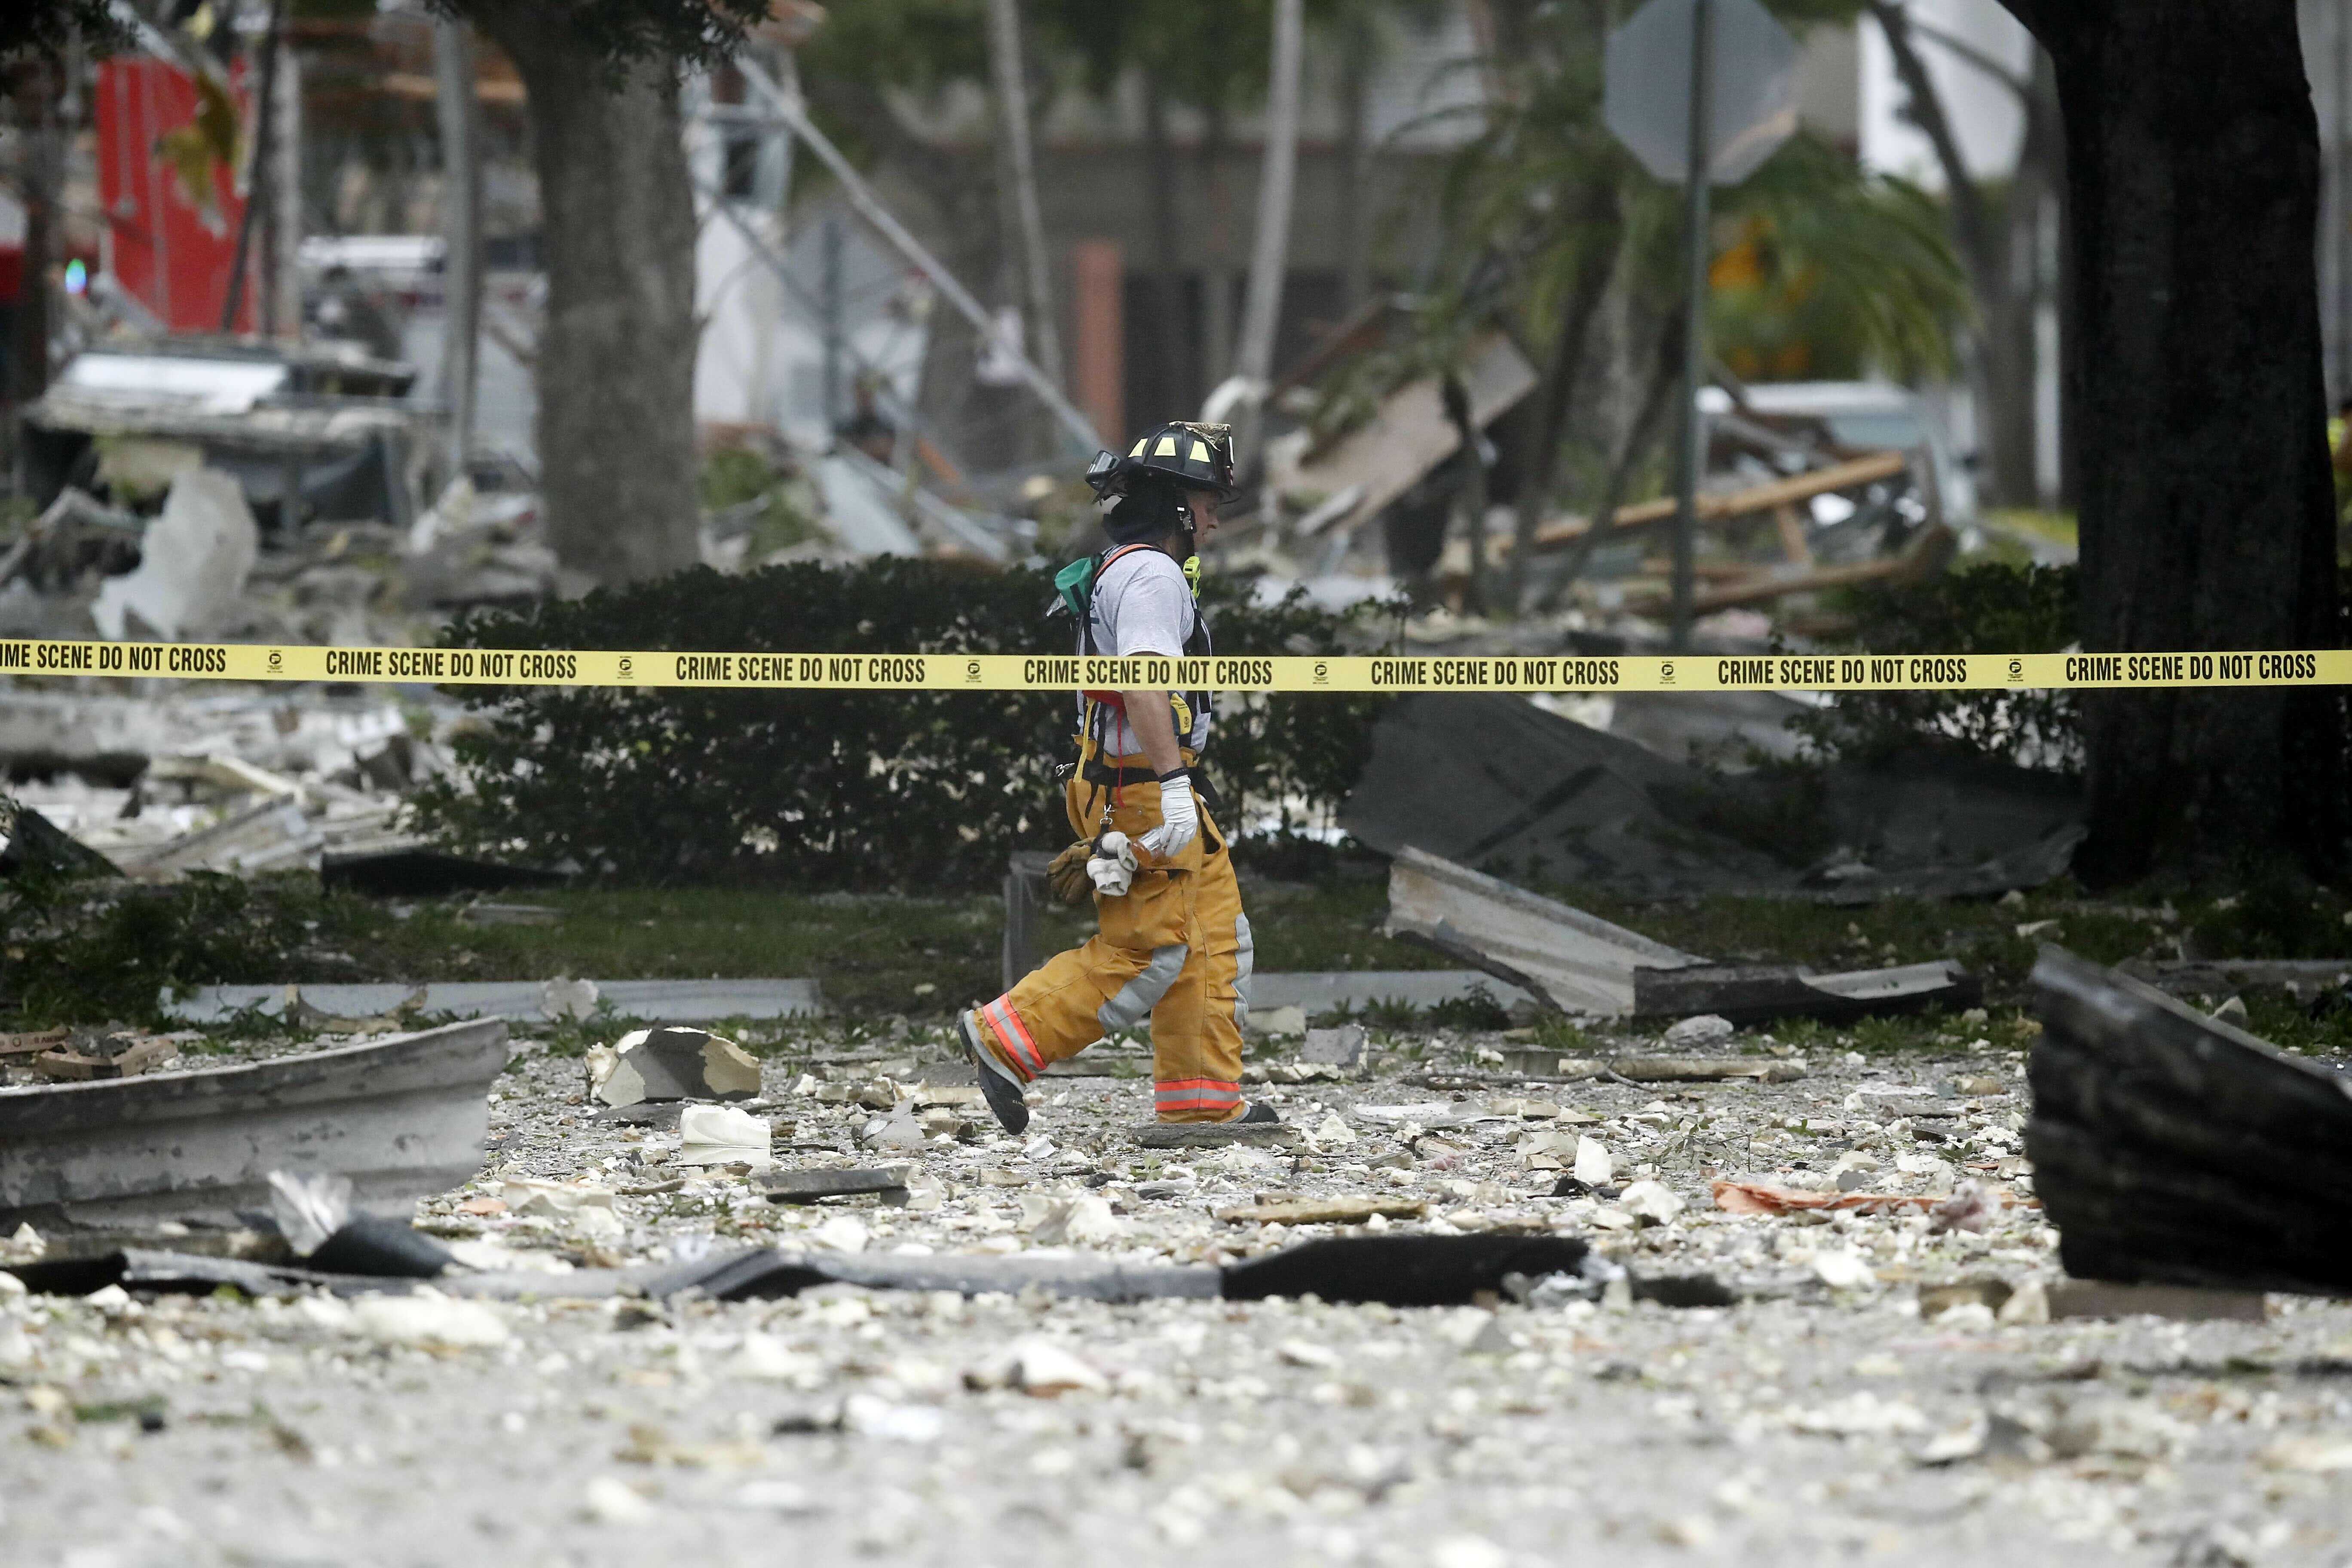 Explosion at Florida shopping plaza injures 20